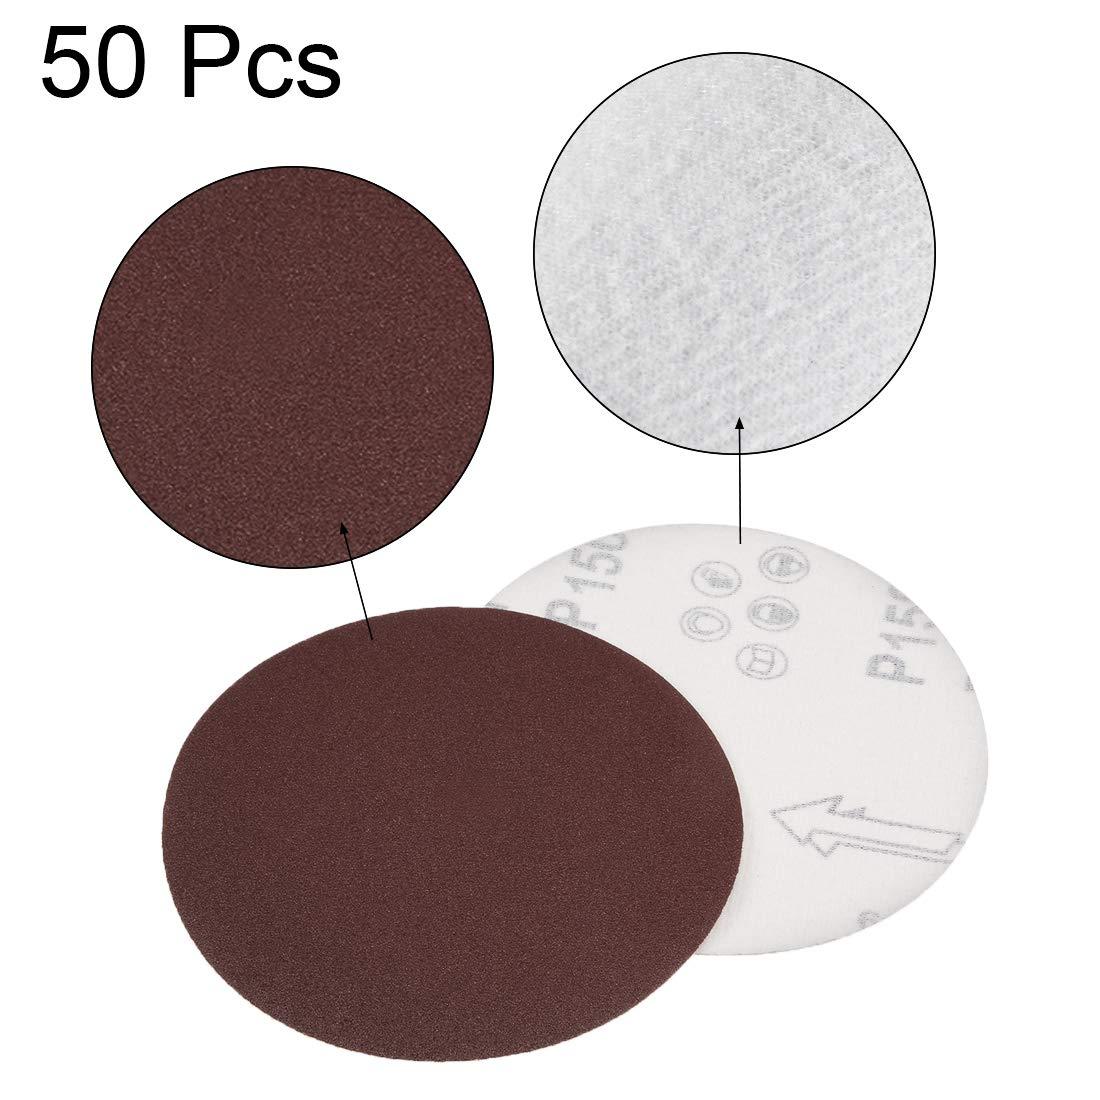 uxcell 5-Inch Sanding Disc 2000 Grits Aluminum Oxide Flocking Back Sandpapers for Sanders 50 Pcs